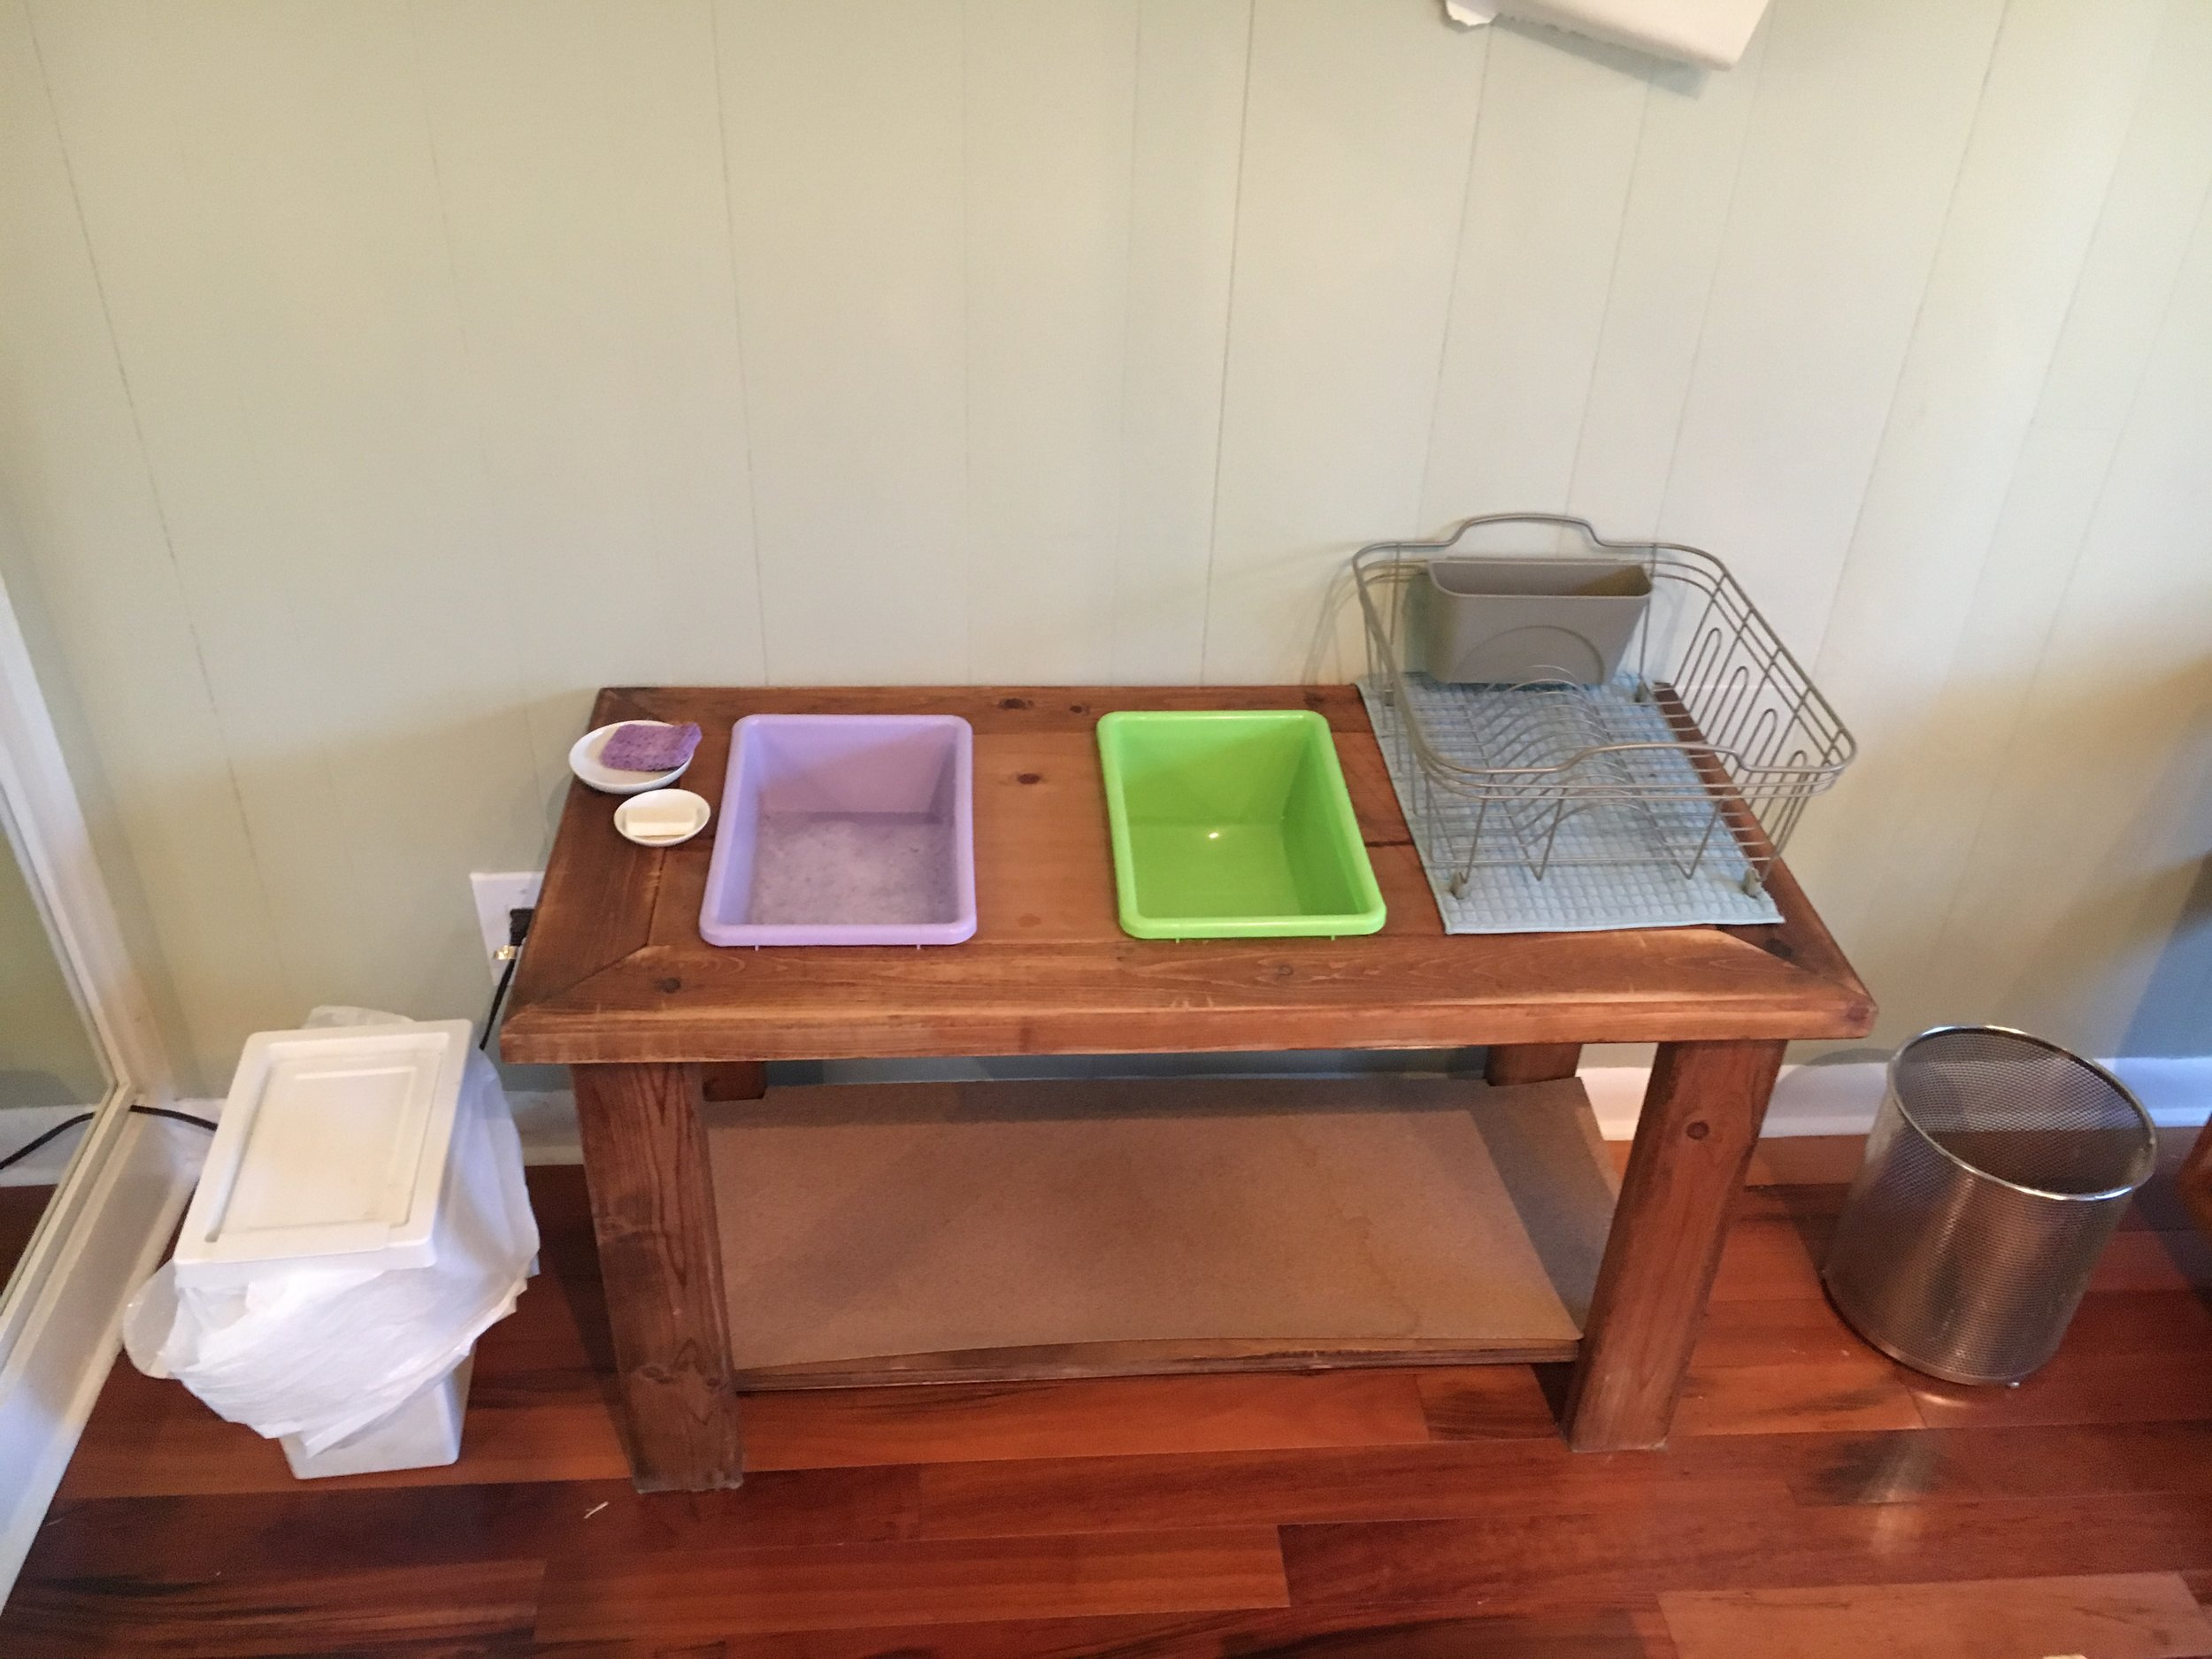 Dish Washing, Trash, and Laundry Bins